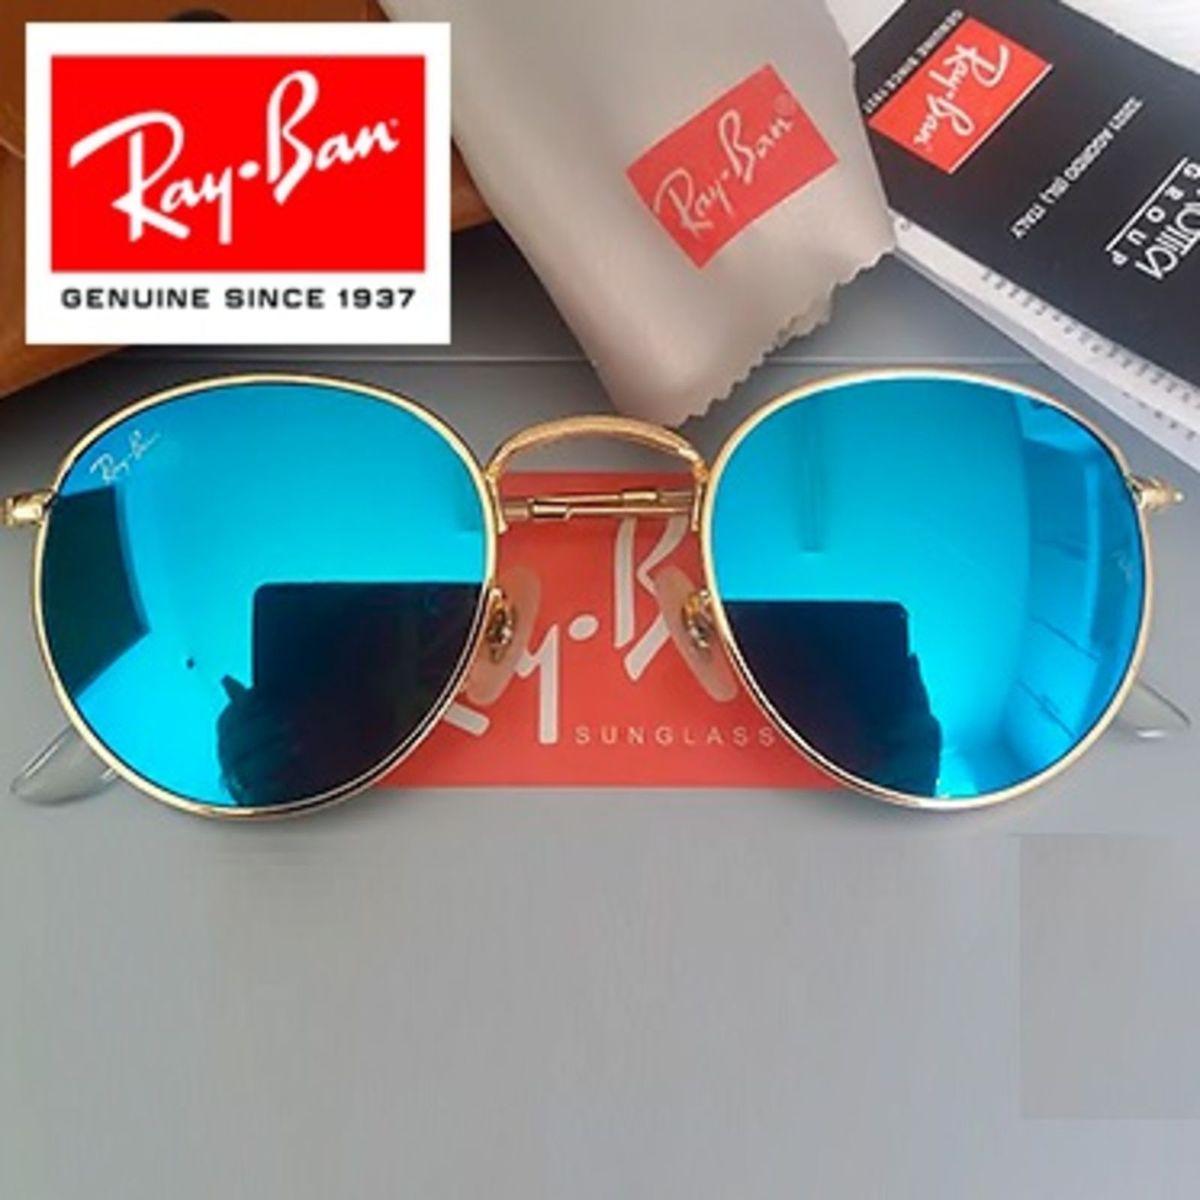 round azul espelhado original - óculos ray-ban.  Czm6ly9wag90b3muzw5qb2vplmnvbs5ici9wcm9kdwn0cy81mtm2mjq0lzzlywrlytbhnzq3zjliywflndcynme1nmyxnwiwyzjklmpwzw  ... bd8770a4ec